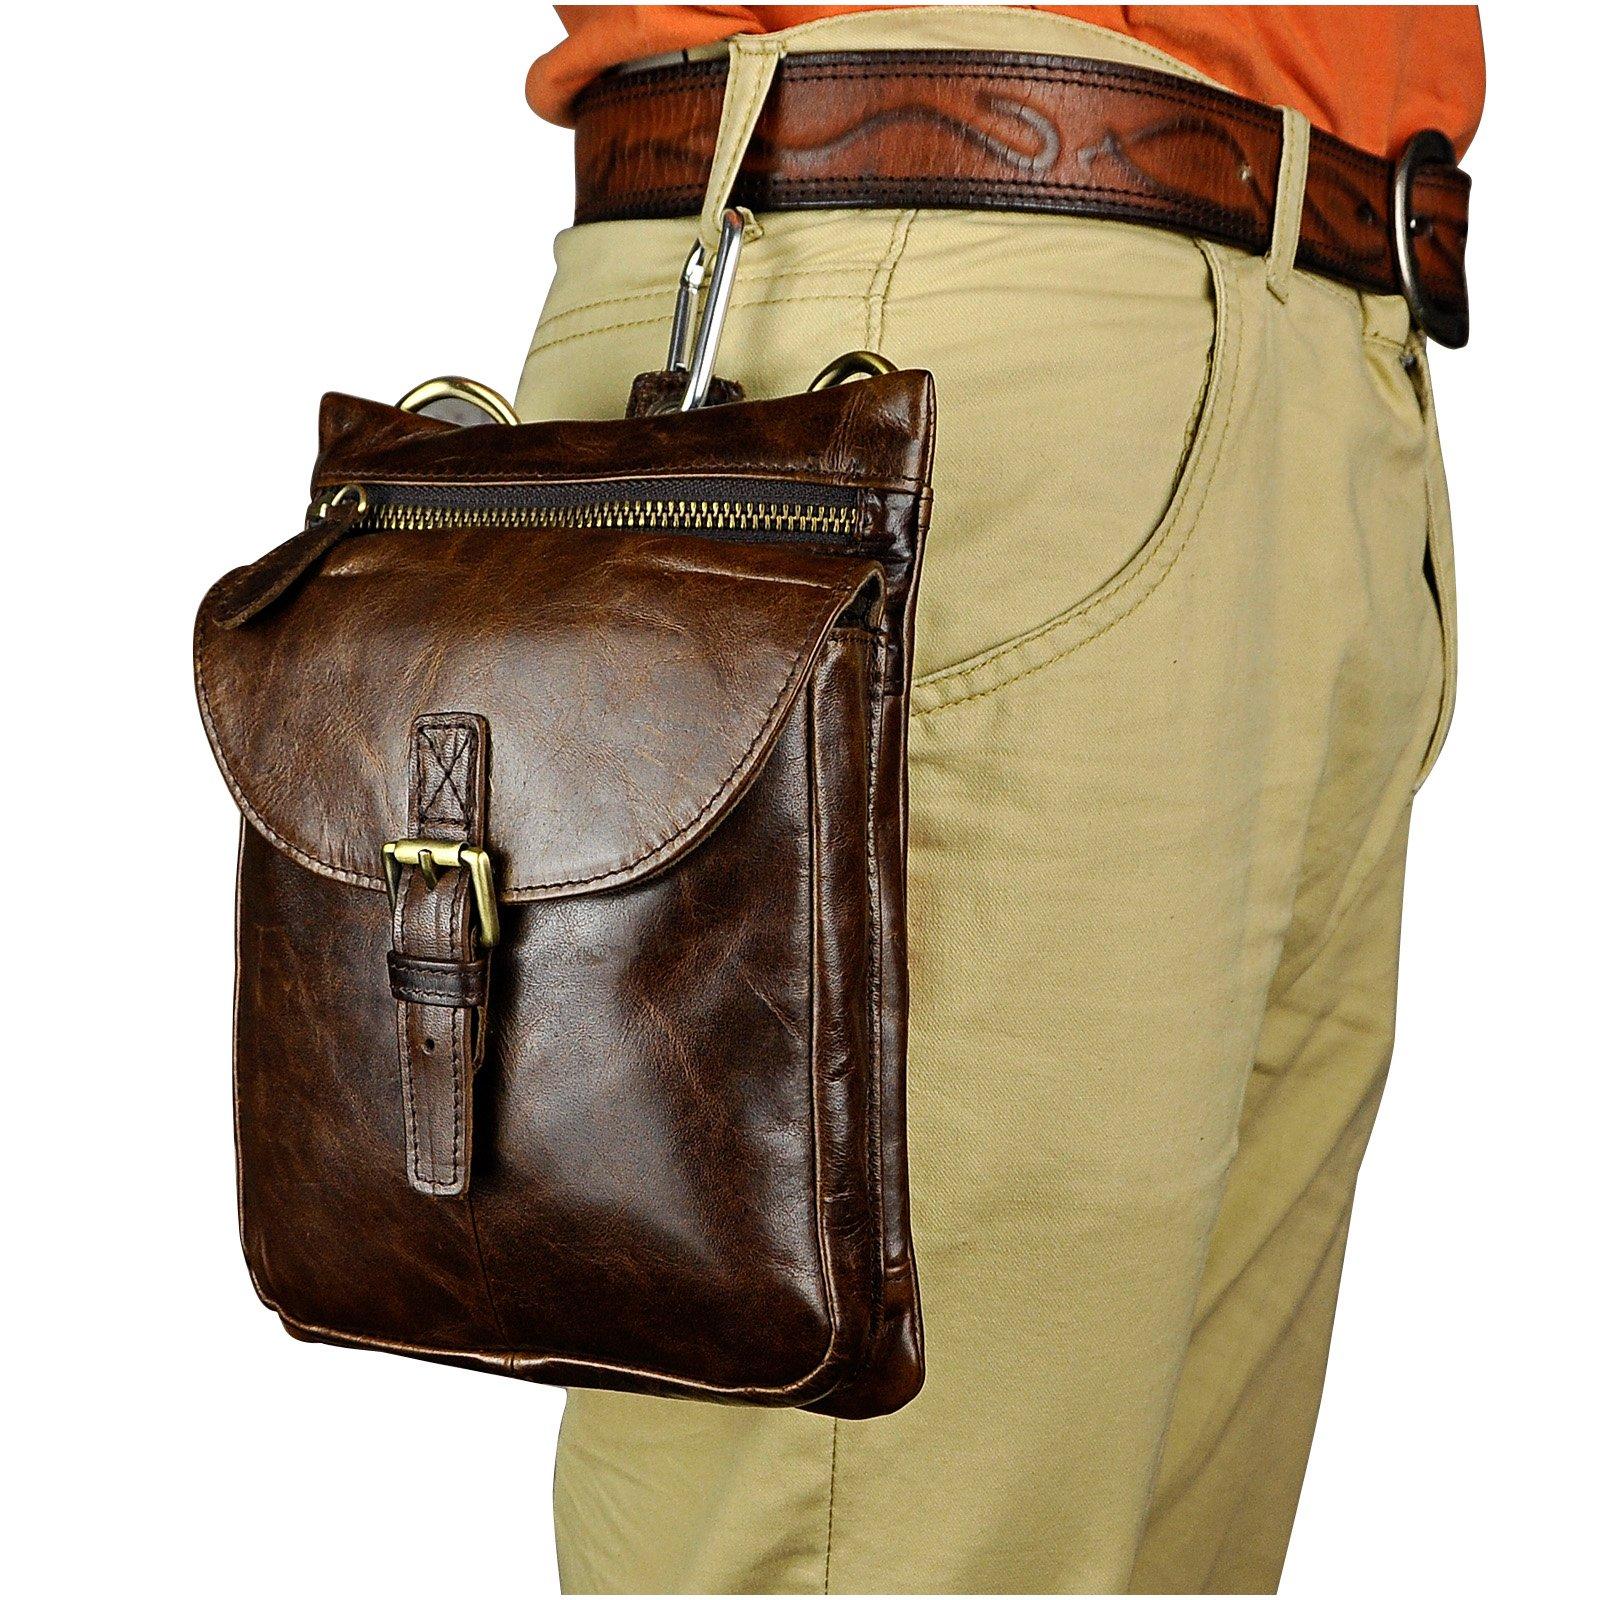 Le'aokuu Mens Genuine Leather Coffee Fanny Small Messenger Shoulder Satchel Waist Bag Pack (The 6552 coffee)